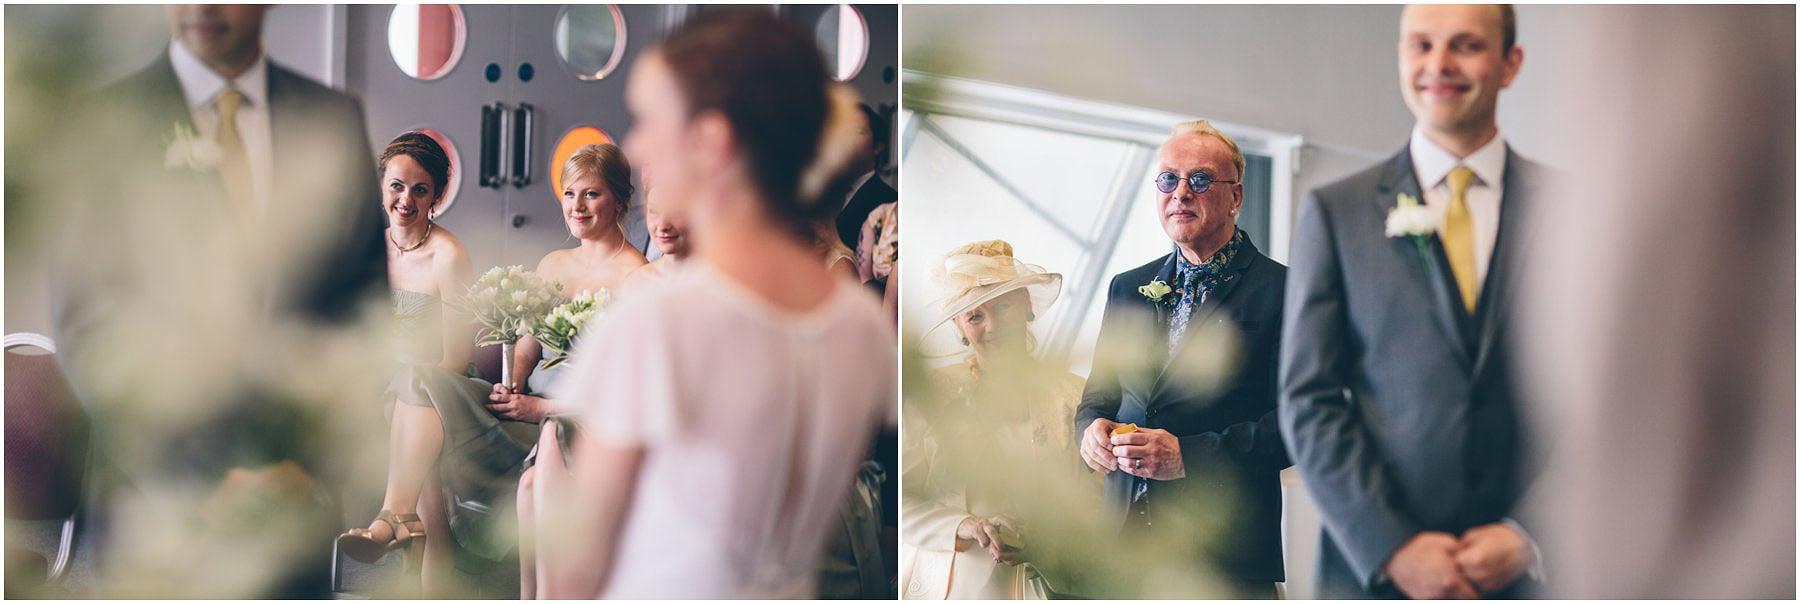 Lowry_Theatre_Wedding_Photography_0041